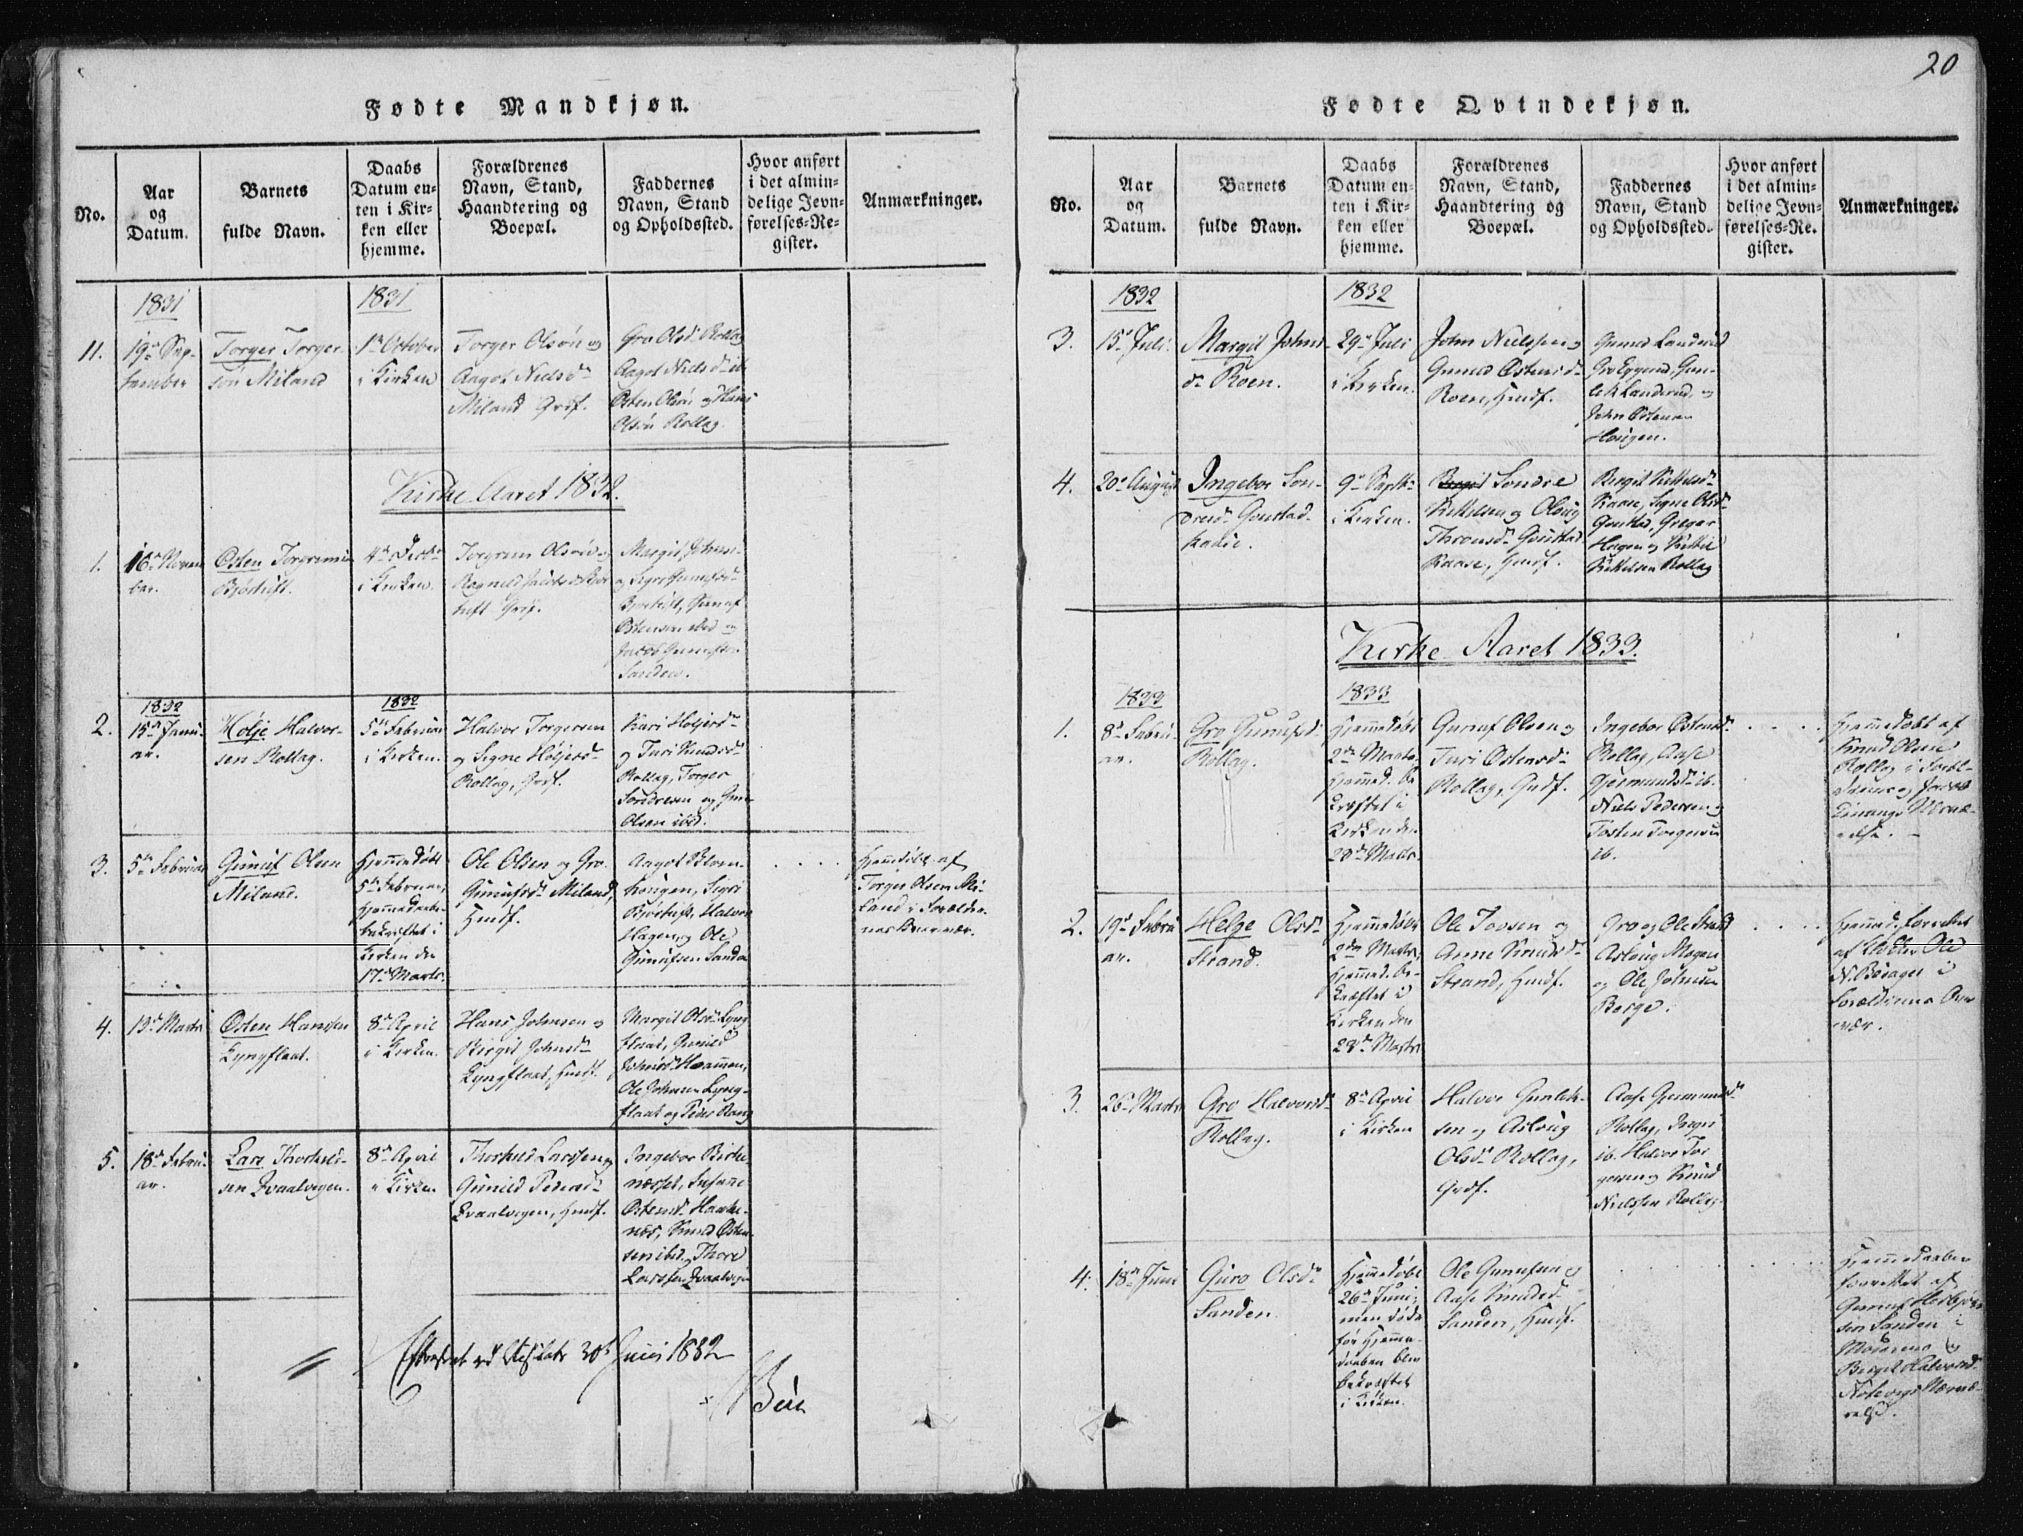 SAKO, Tinn kirkebøker, F/Fb/L0001: Ministerialbok nr. II 1, 1815-1843, s. 20